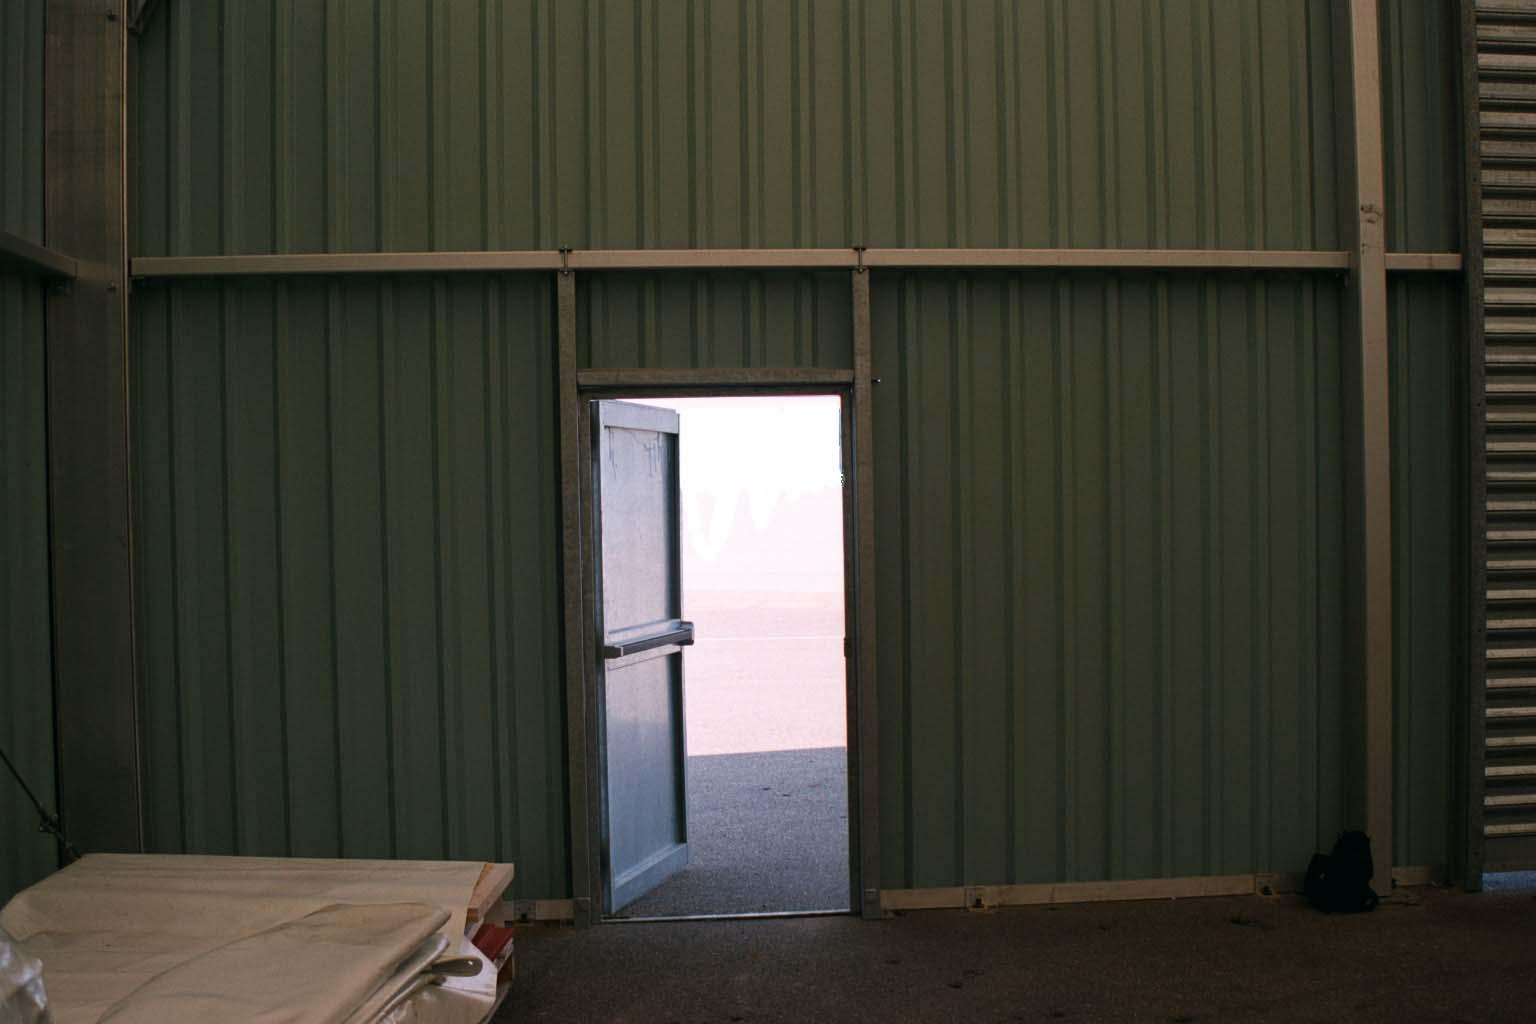 Alquiler carpas industriales carpa industrial almacenes for Puertas industriales